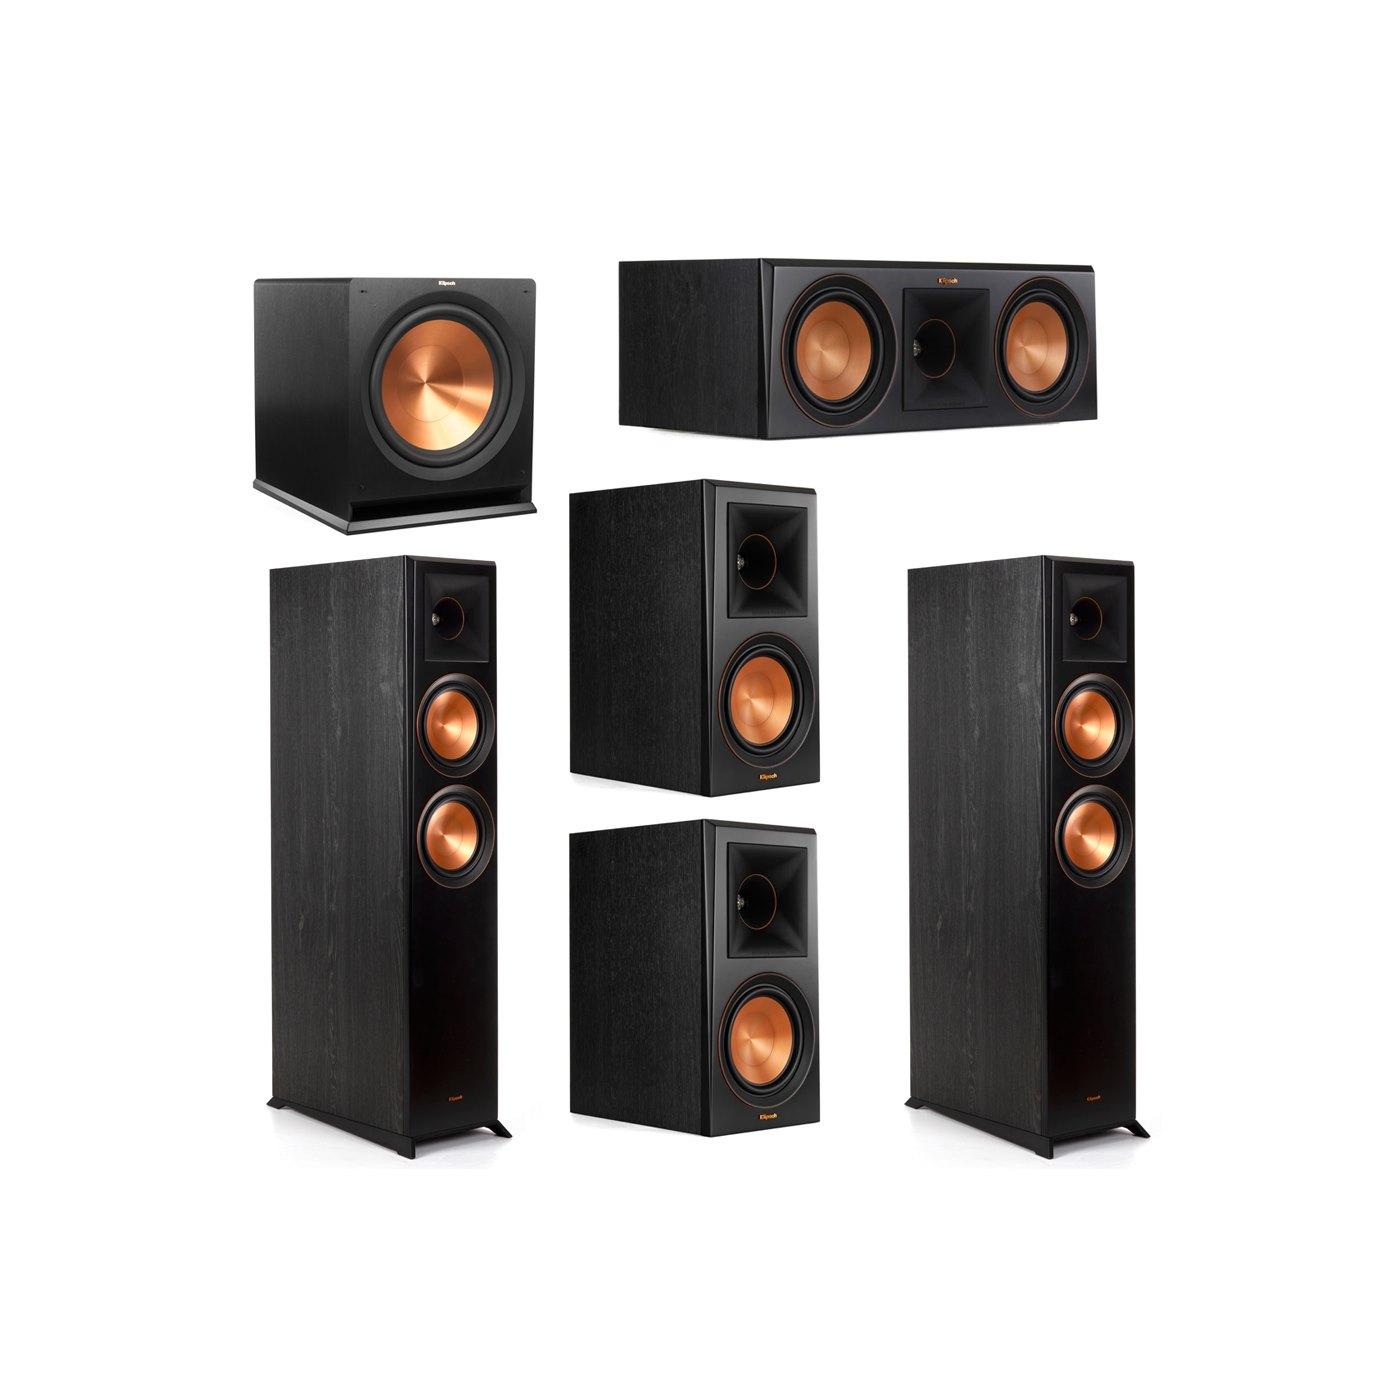 Klipsch 5.1 System with 2 RP-6000F Floorstanding Speakers, 1 Klipsch RP-600C Center Speaker, 2 Klipsch RP-600M Surround Speakers, 1 Klipsch R-115SW Subwoofer